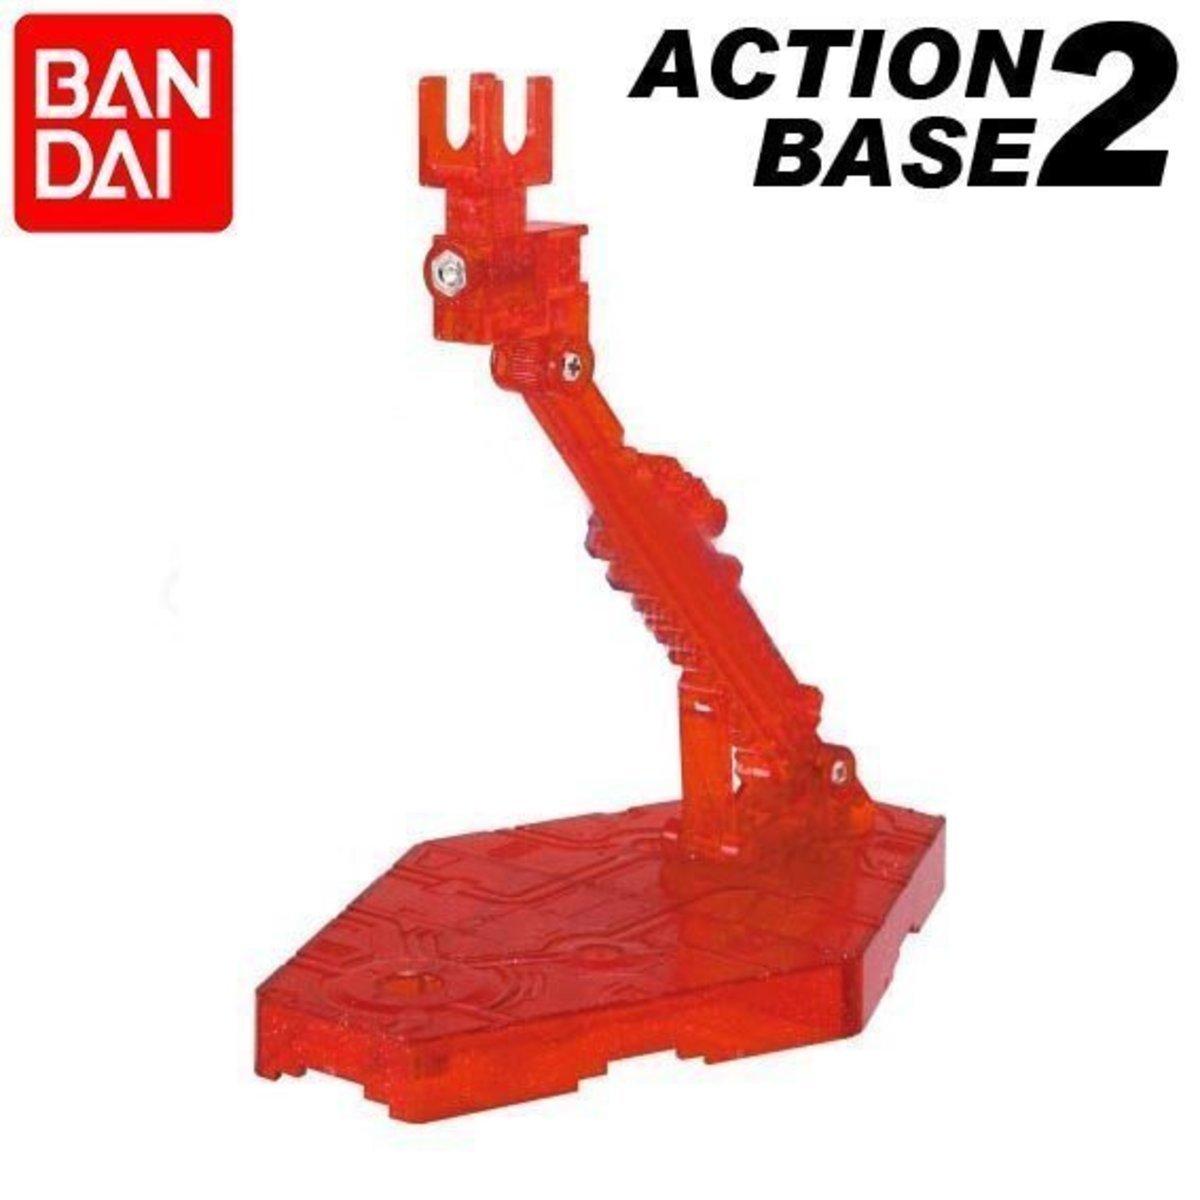 Action Base  2 高達模型  可動 展示架 支架:透明紅色